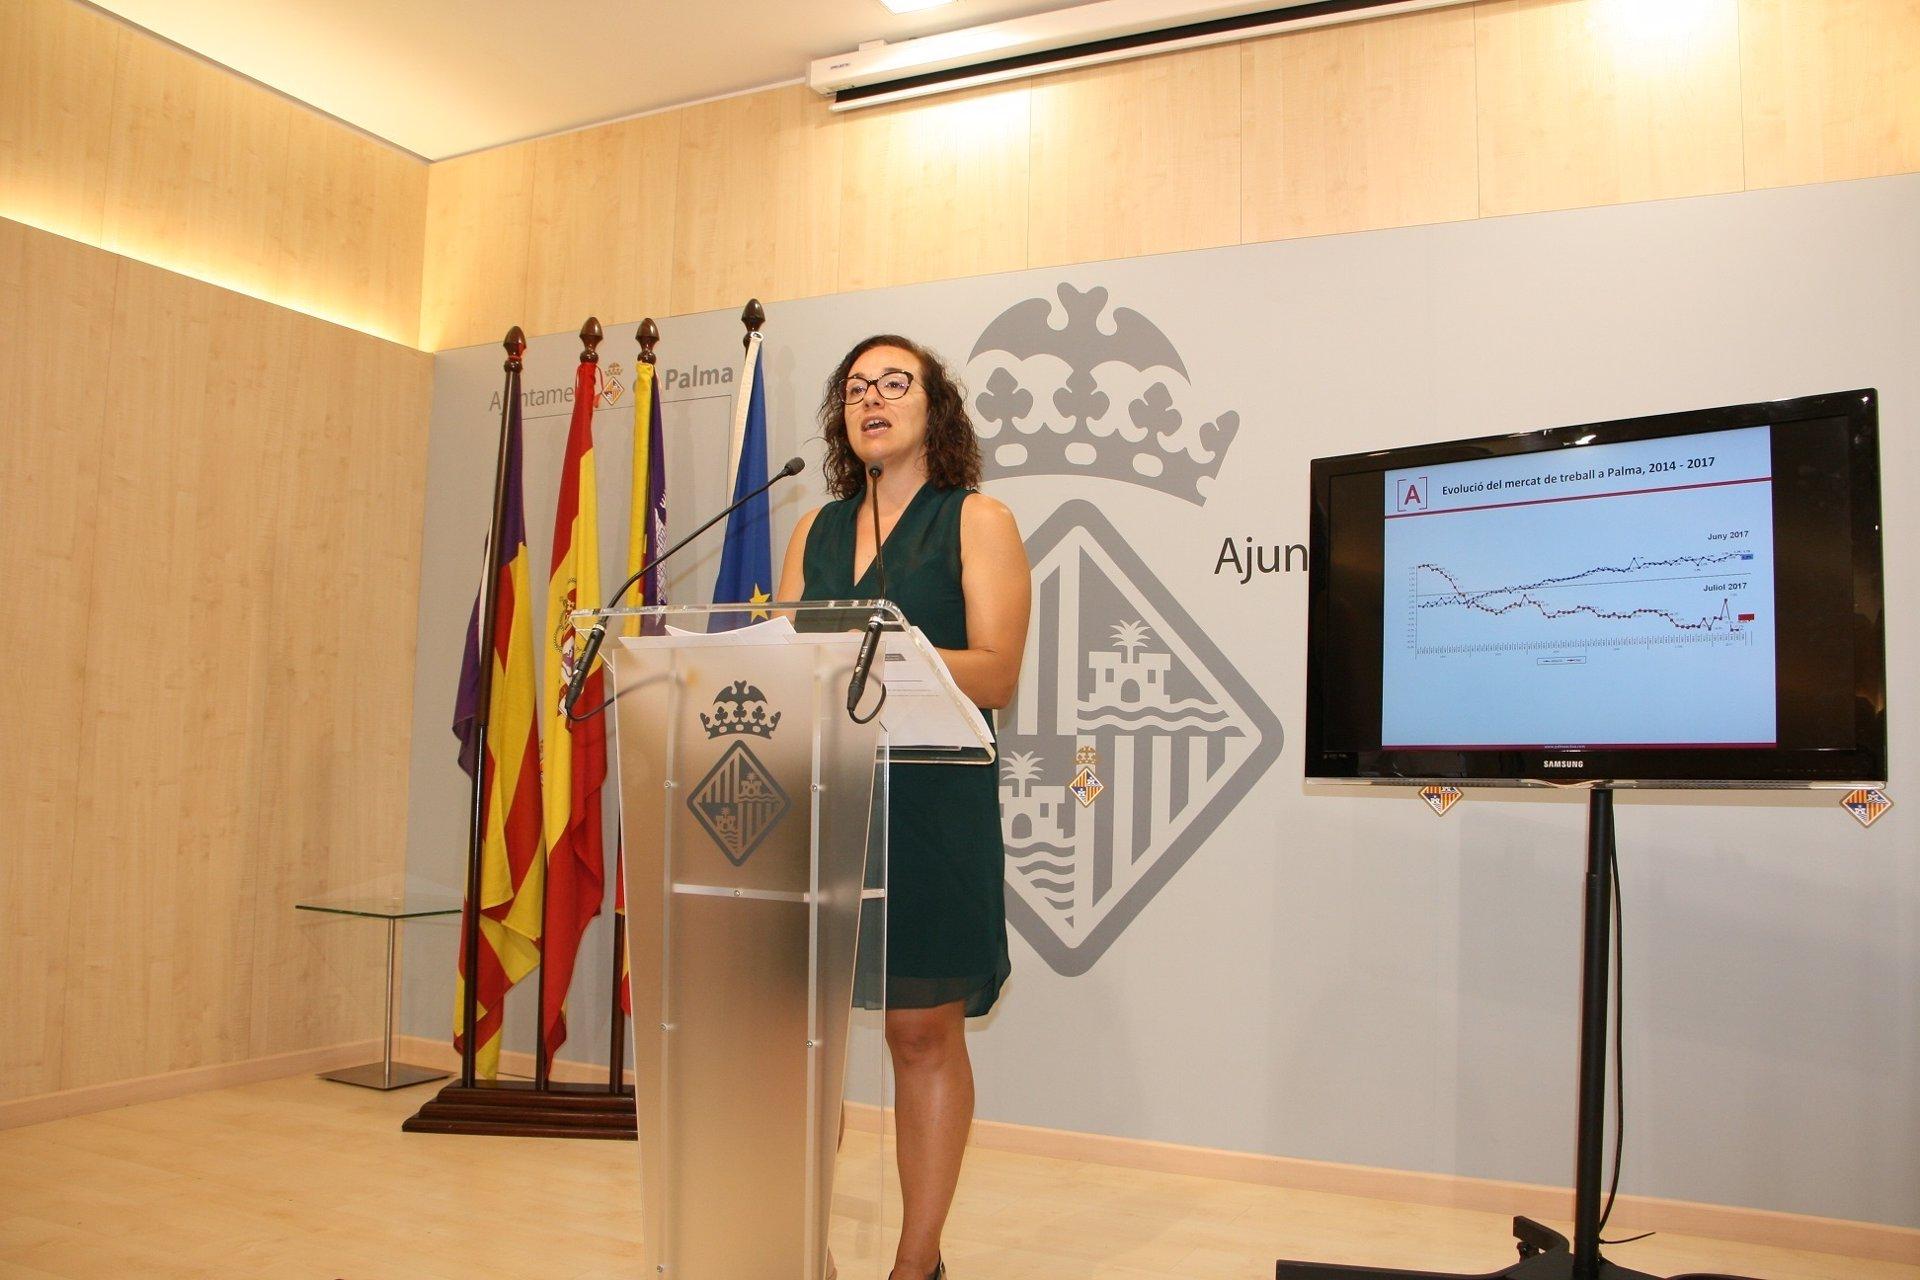 https://img.europapress.es/fotoweb/fotonoticia_20170808135056_1920.jpg